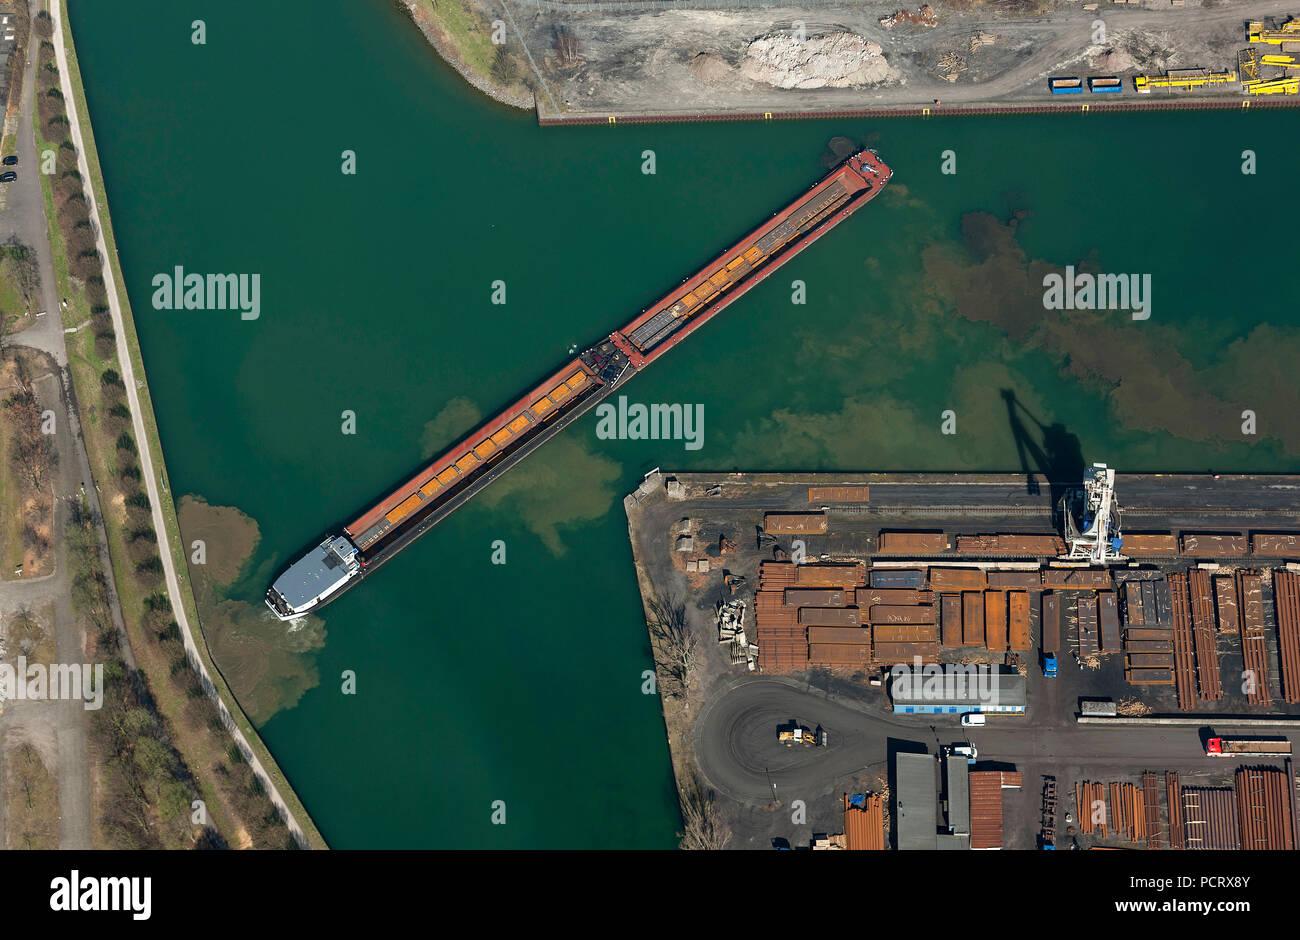 Aerial view, Dortmund harbor, Eisenhafen, Dortmund-Ems canal, push barge, cargo ship, inland shipping, turning maneuver, mud, departing maneuver, barge, Dortmund, Ruhr area, North Rhine-Westphalia, Germany, Europe - Stock Image